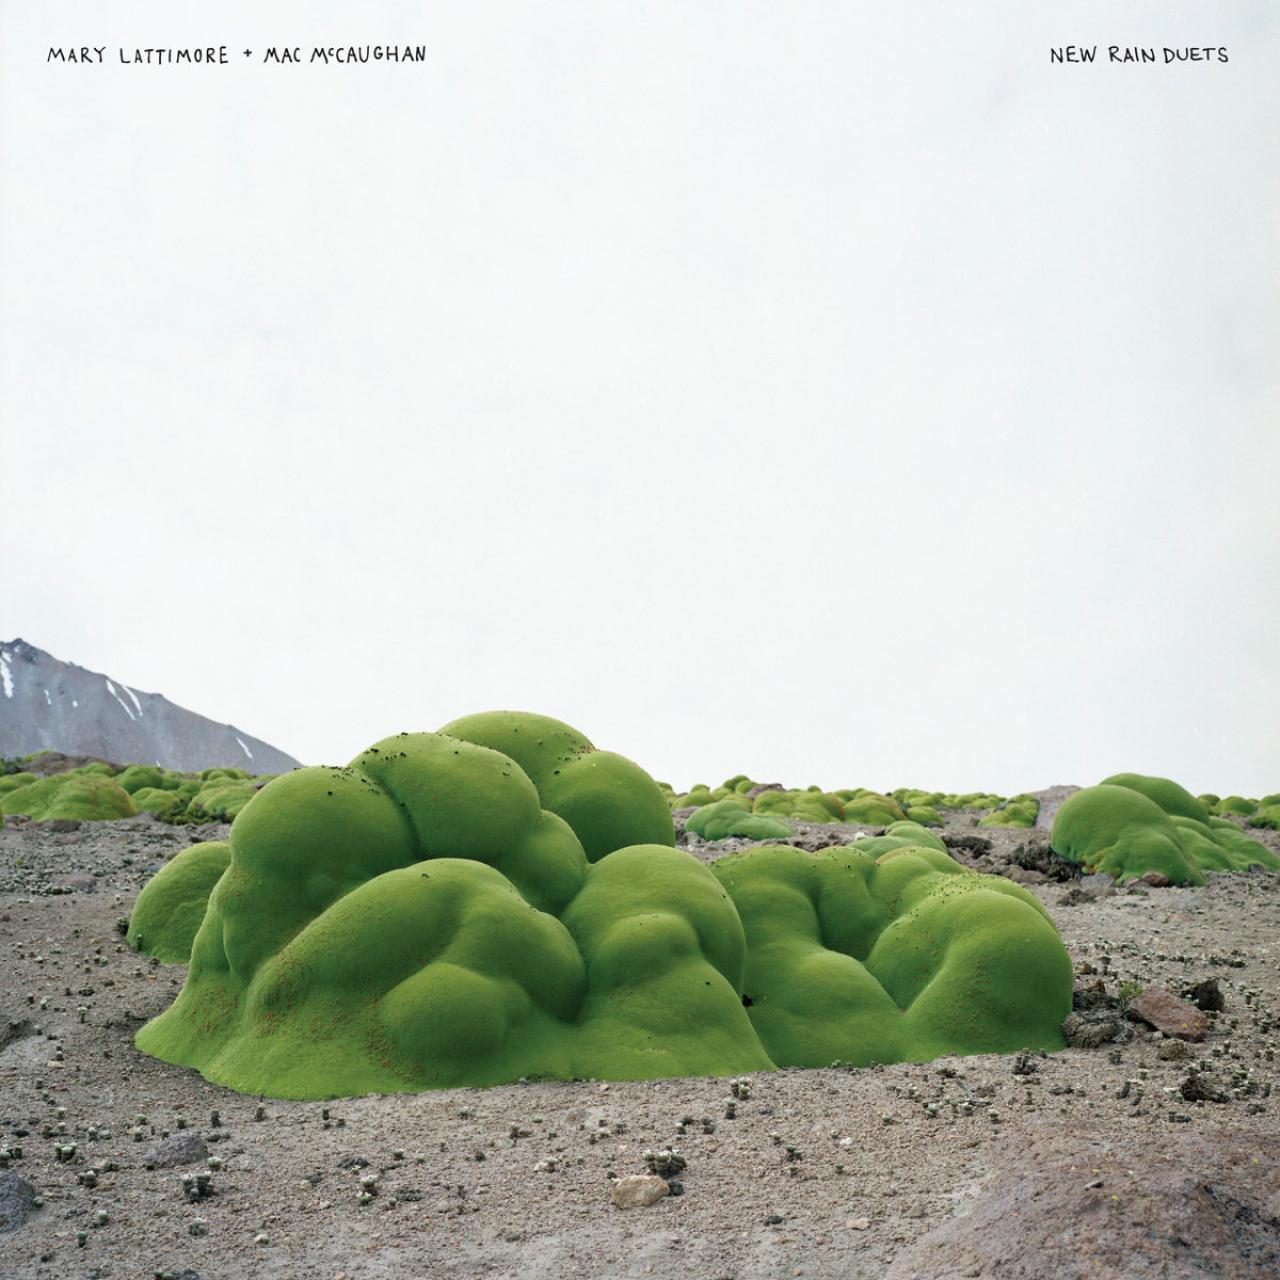 Mary Lattimore and Mac McCaughan - New Rain Duets album cover